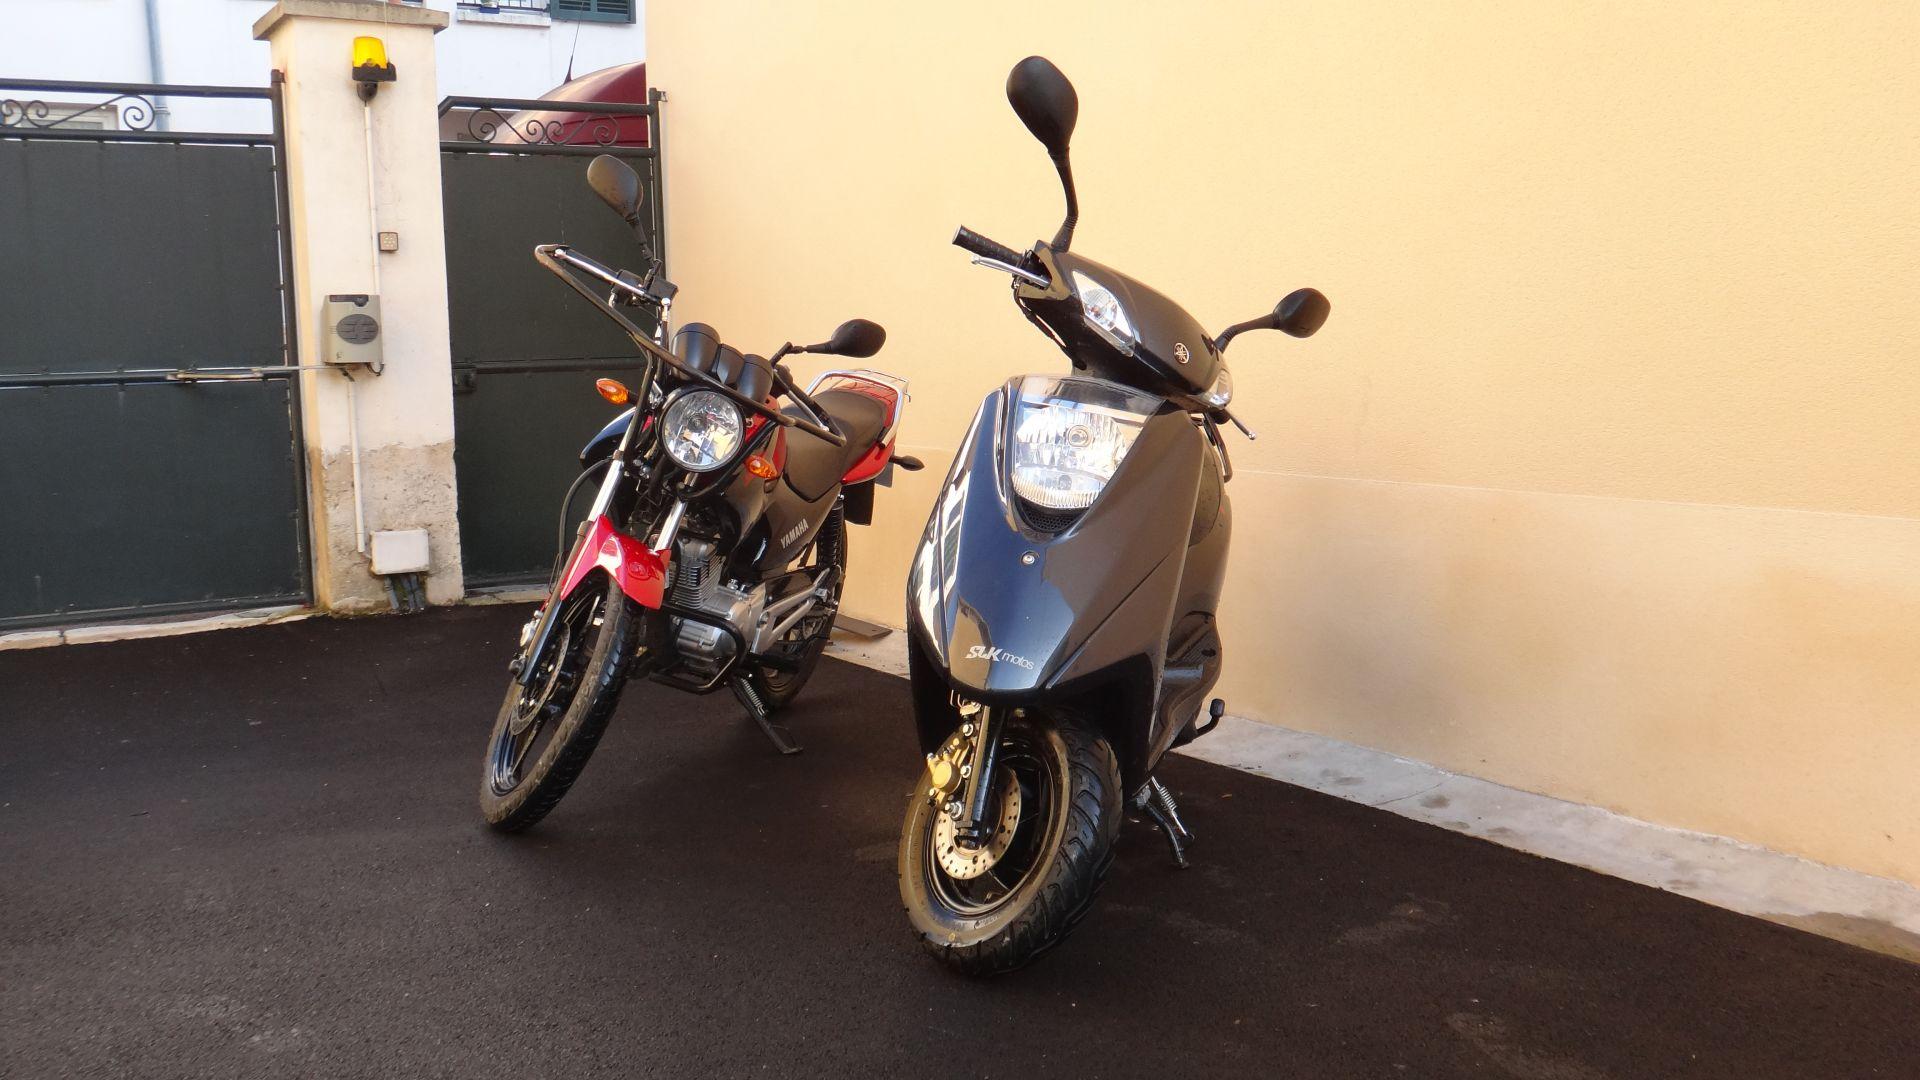 3 Yamaha 125 Permis A1 (YS + Scooter)